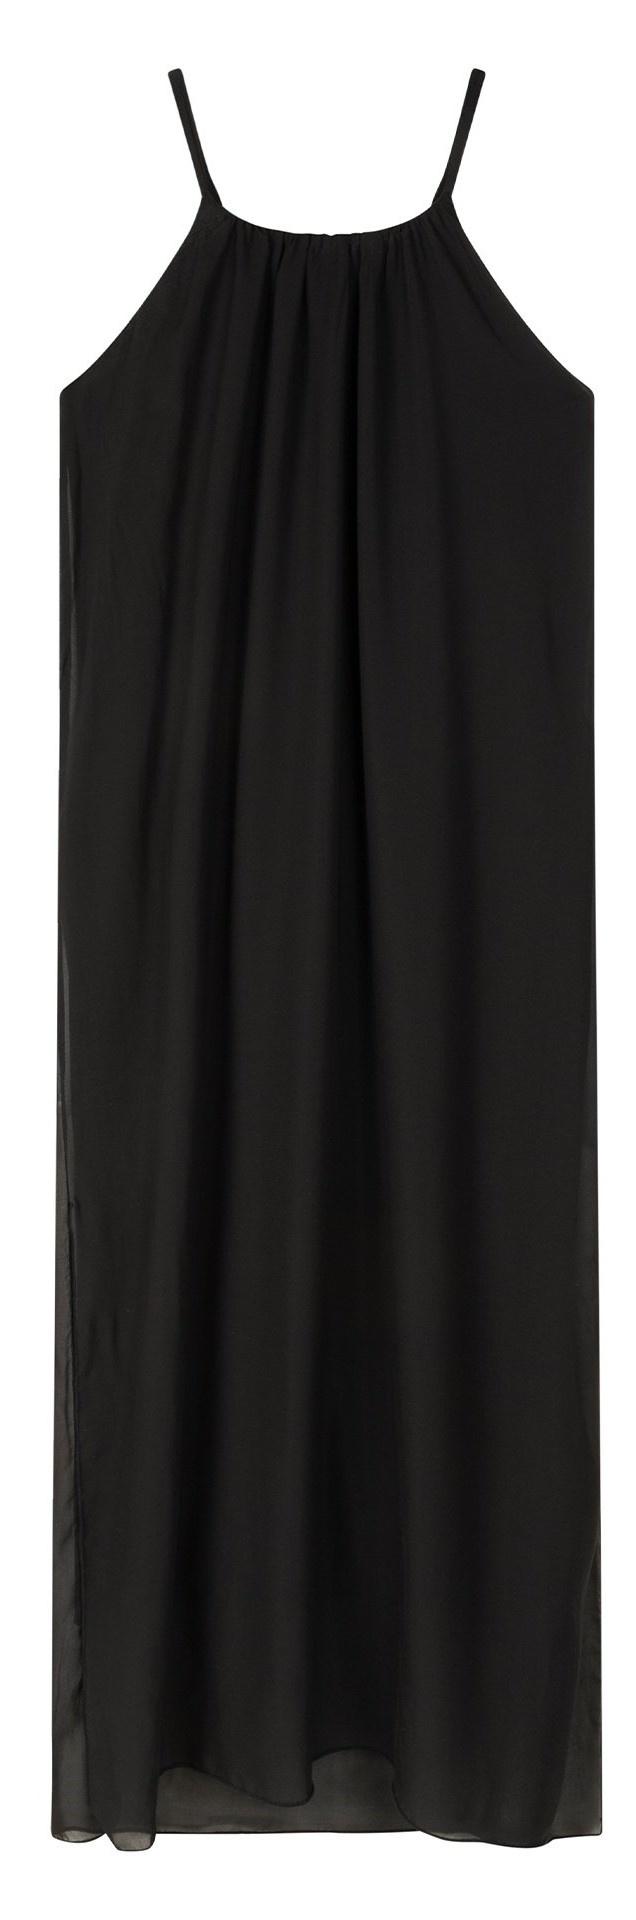 Jurk strappy dress layers black-1